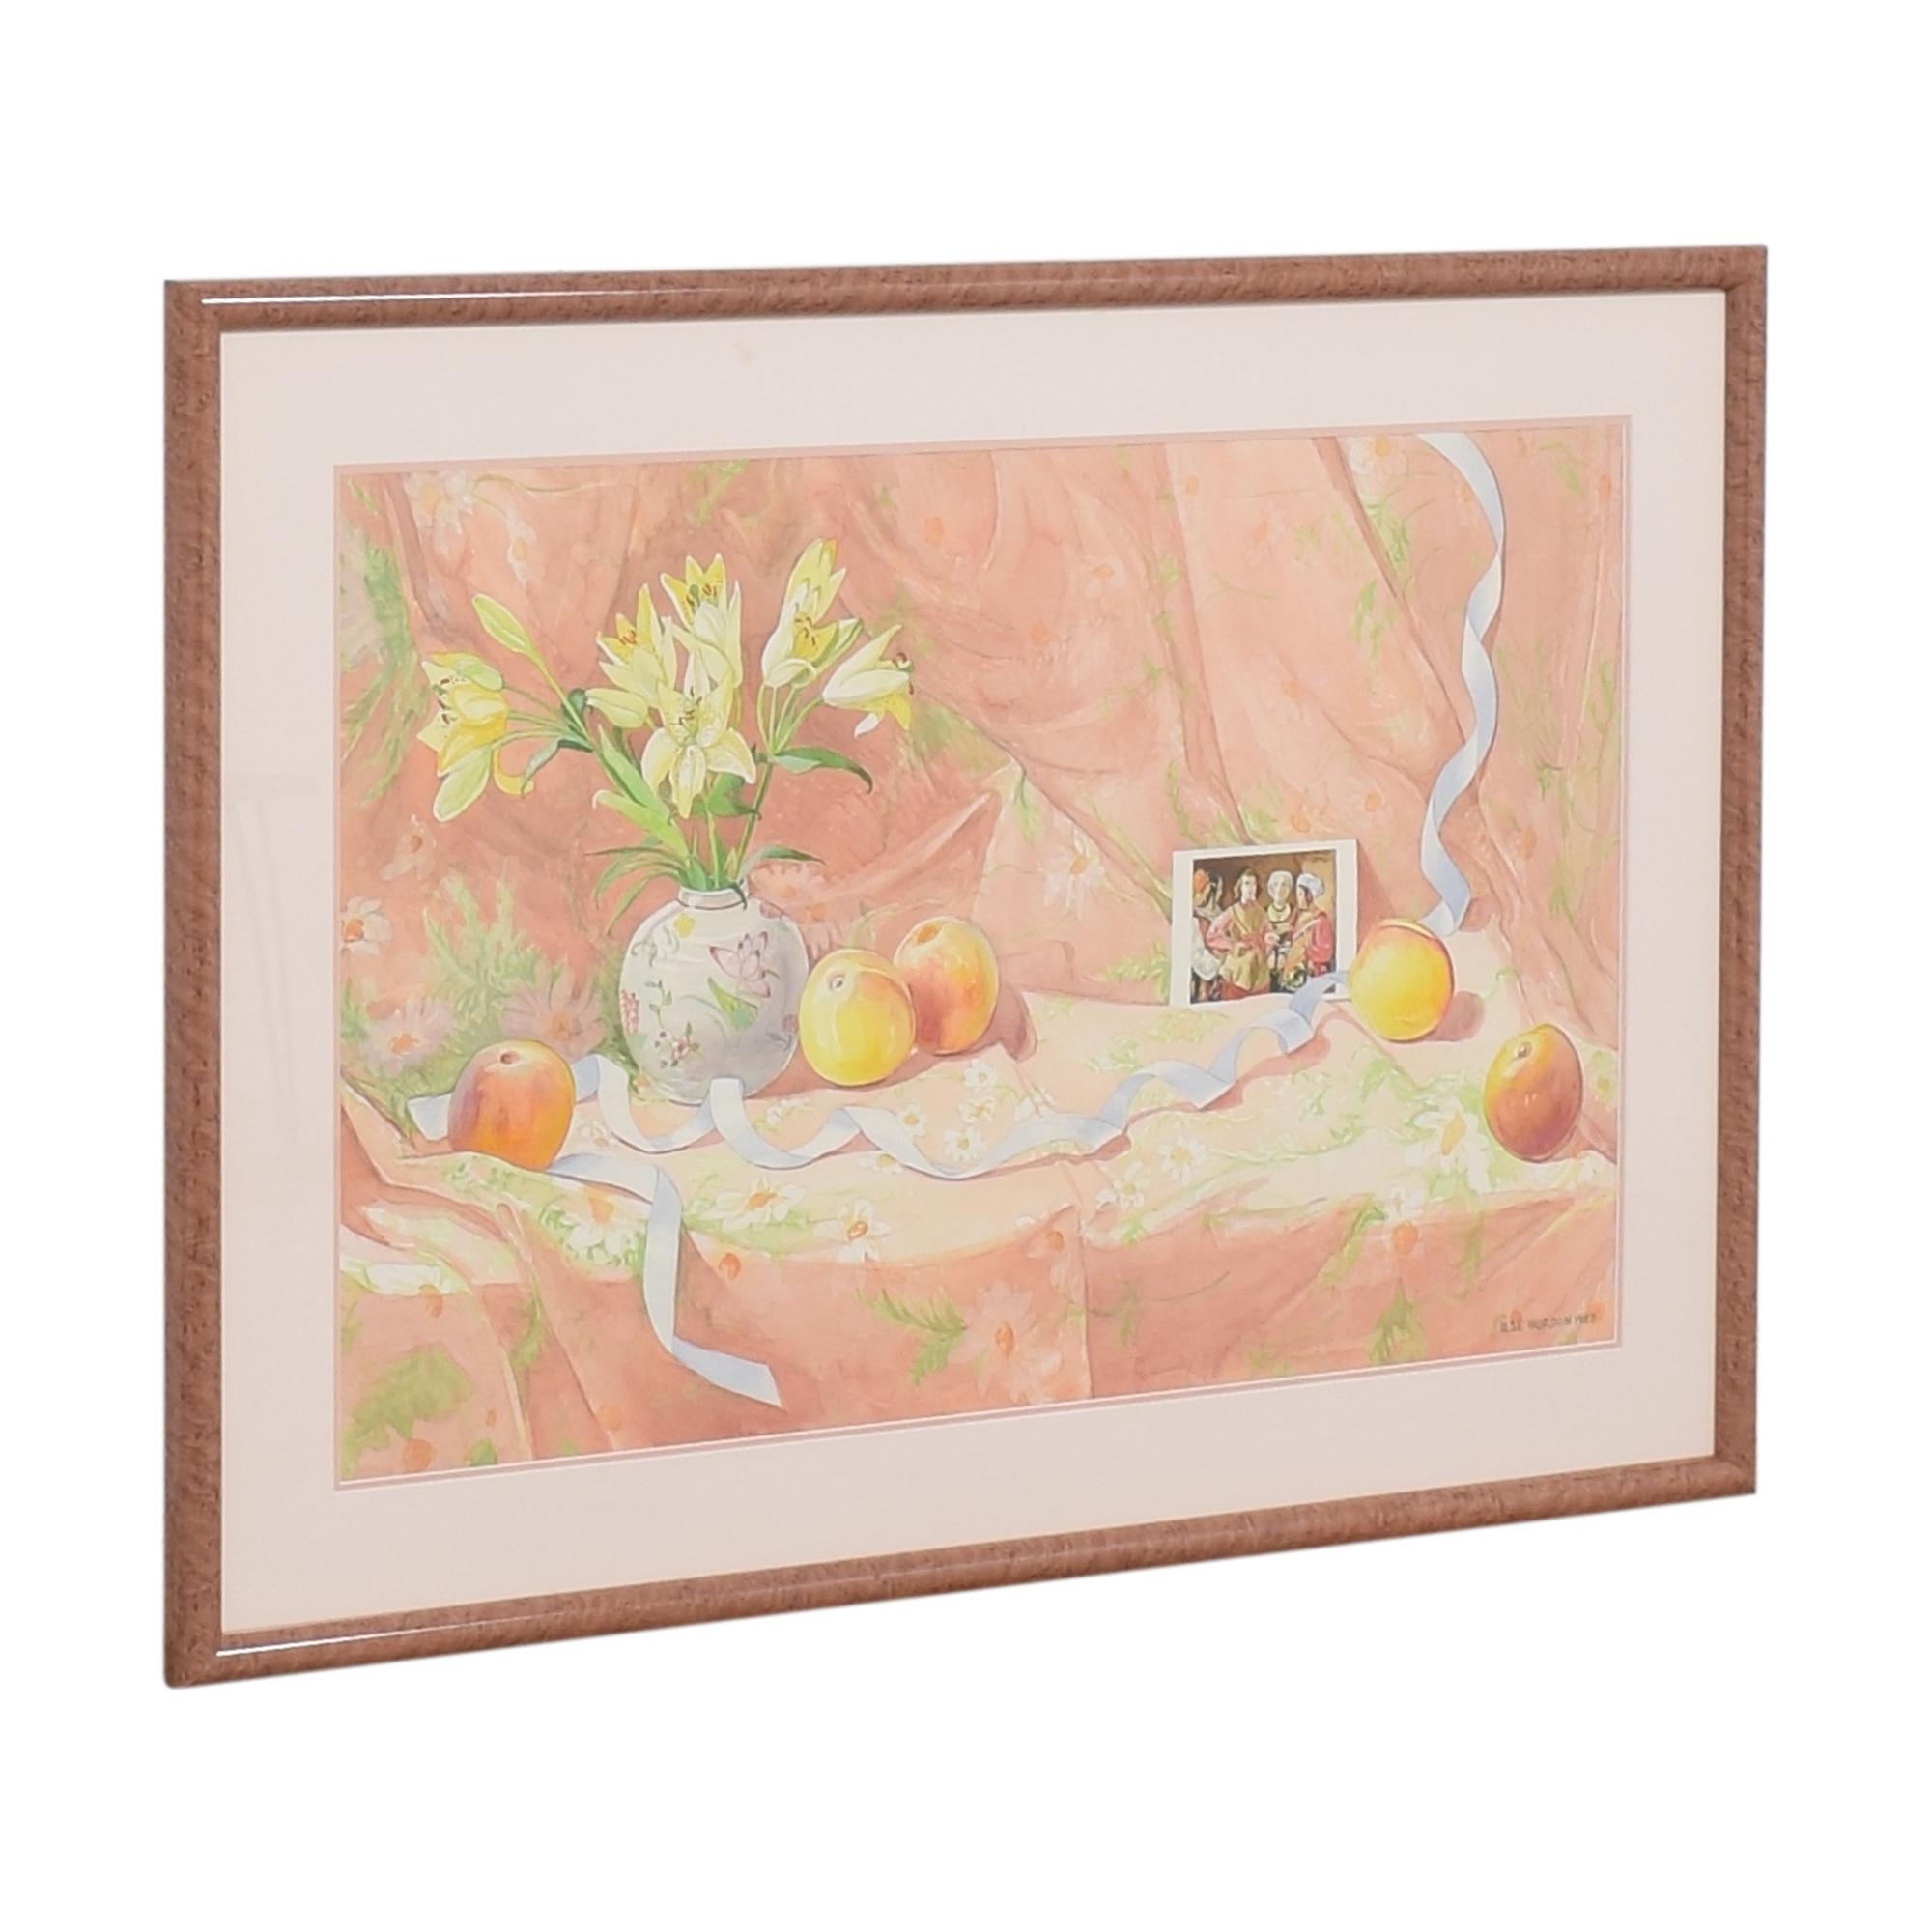 Framed Ilse Gordon Still Life Wall Art coupon